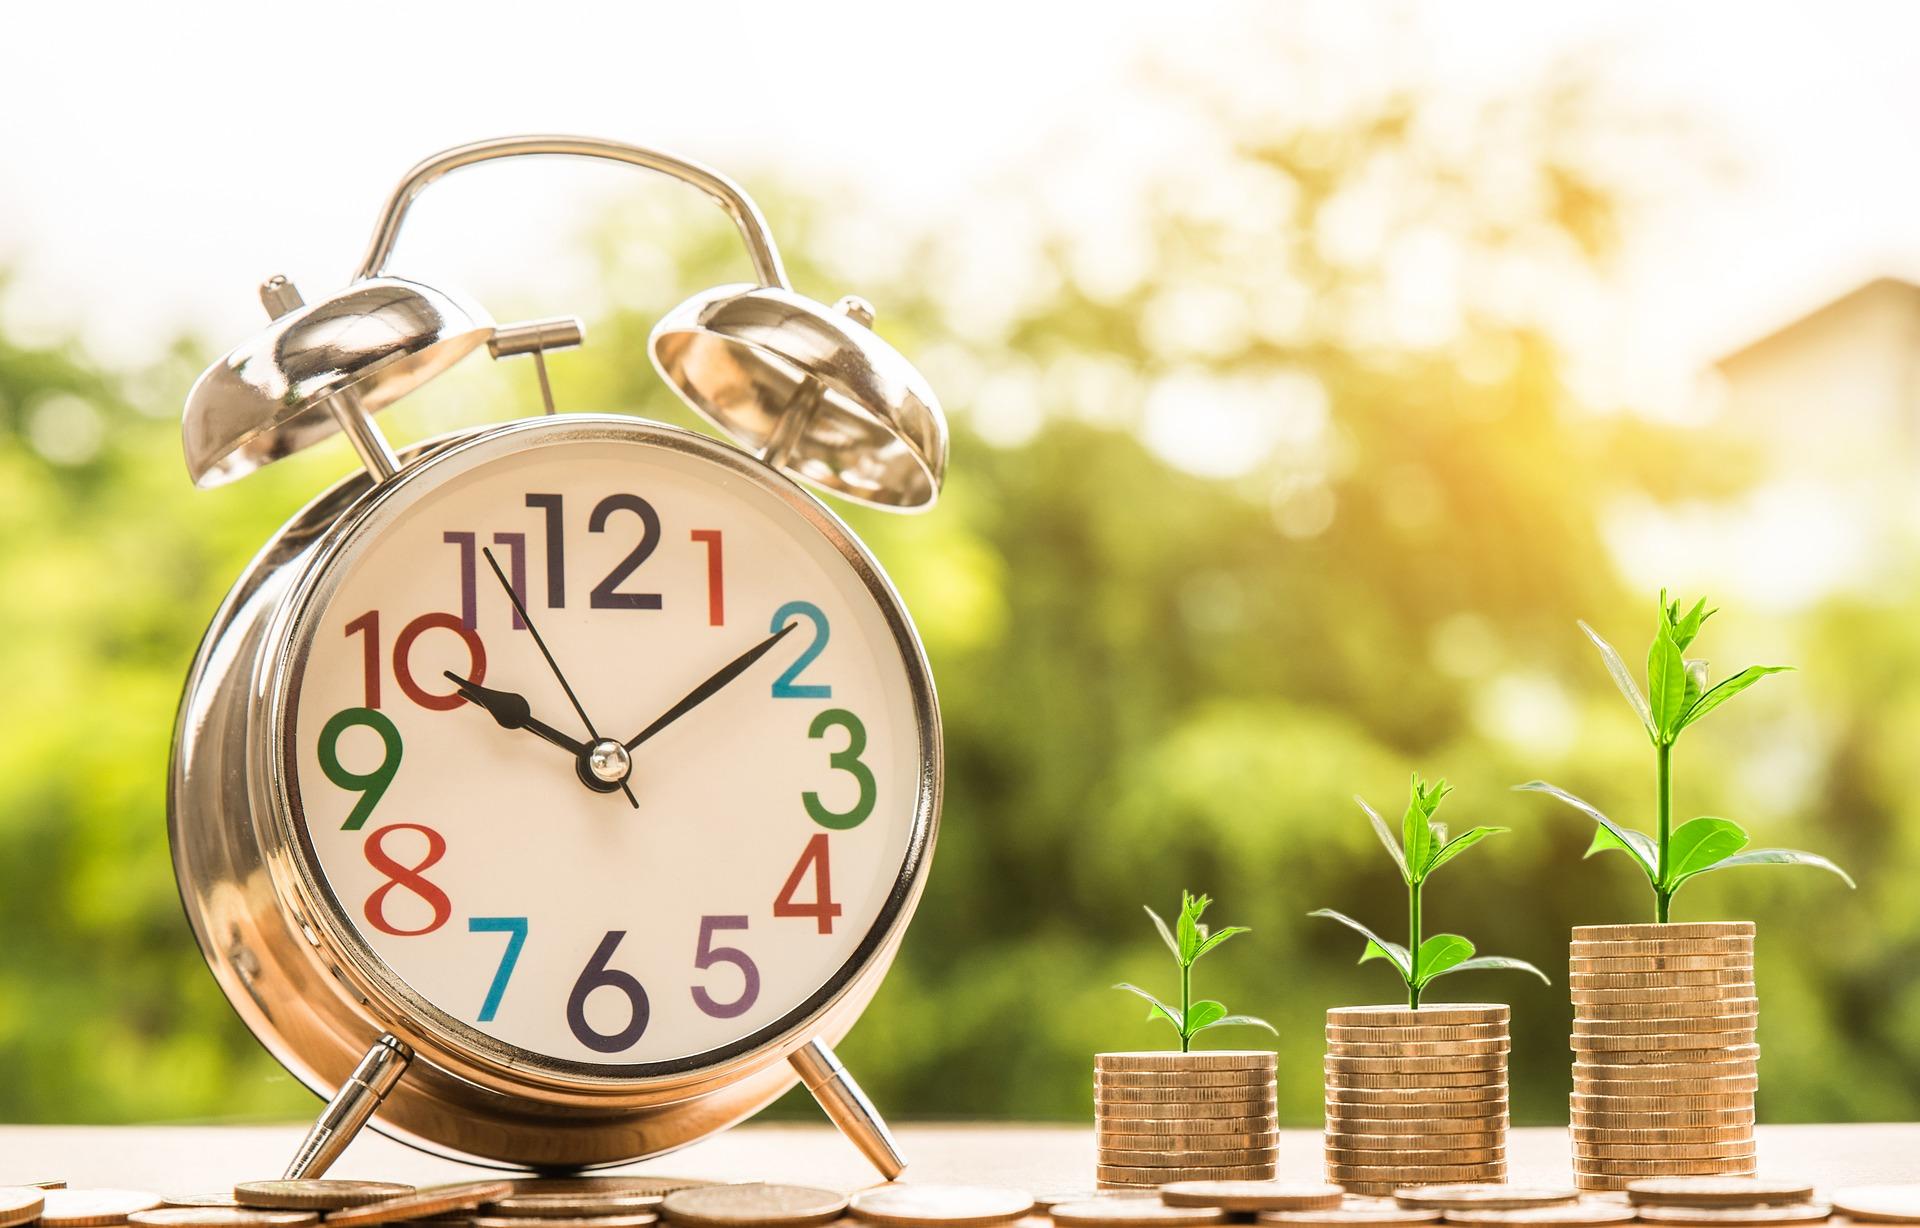 6 great saving tips!